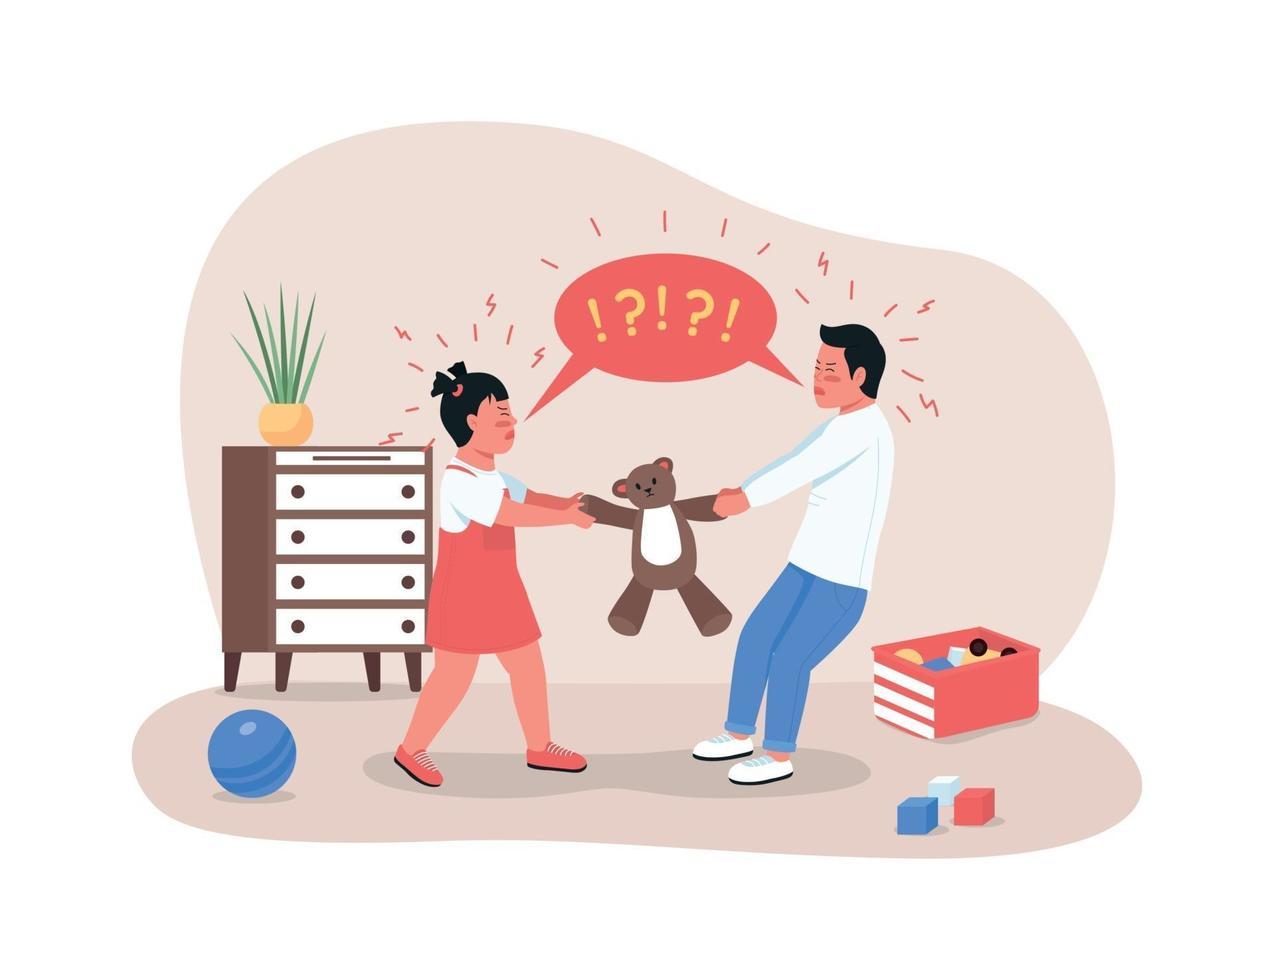 Children fighting over toy 2D vector web banner, poster